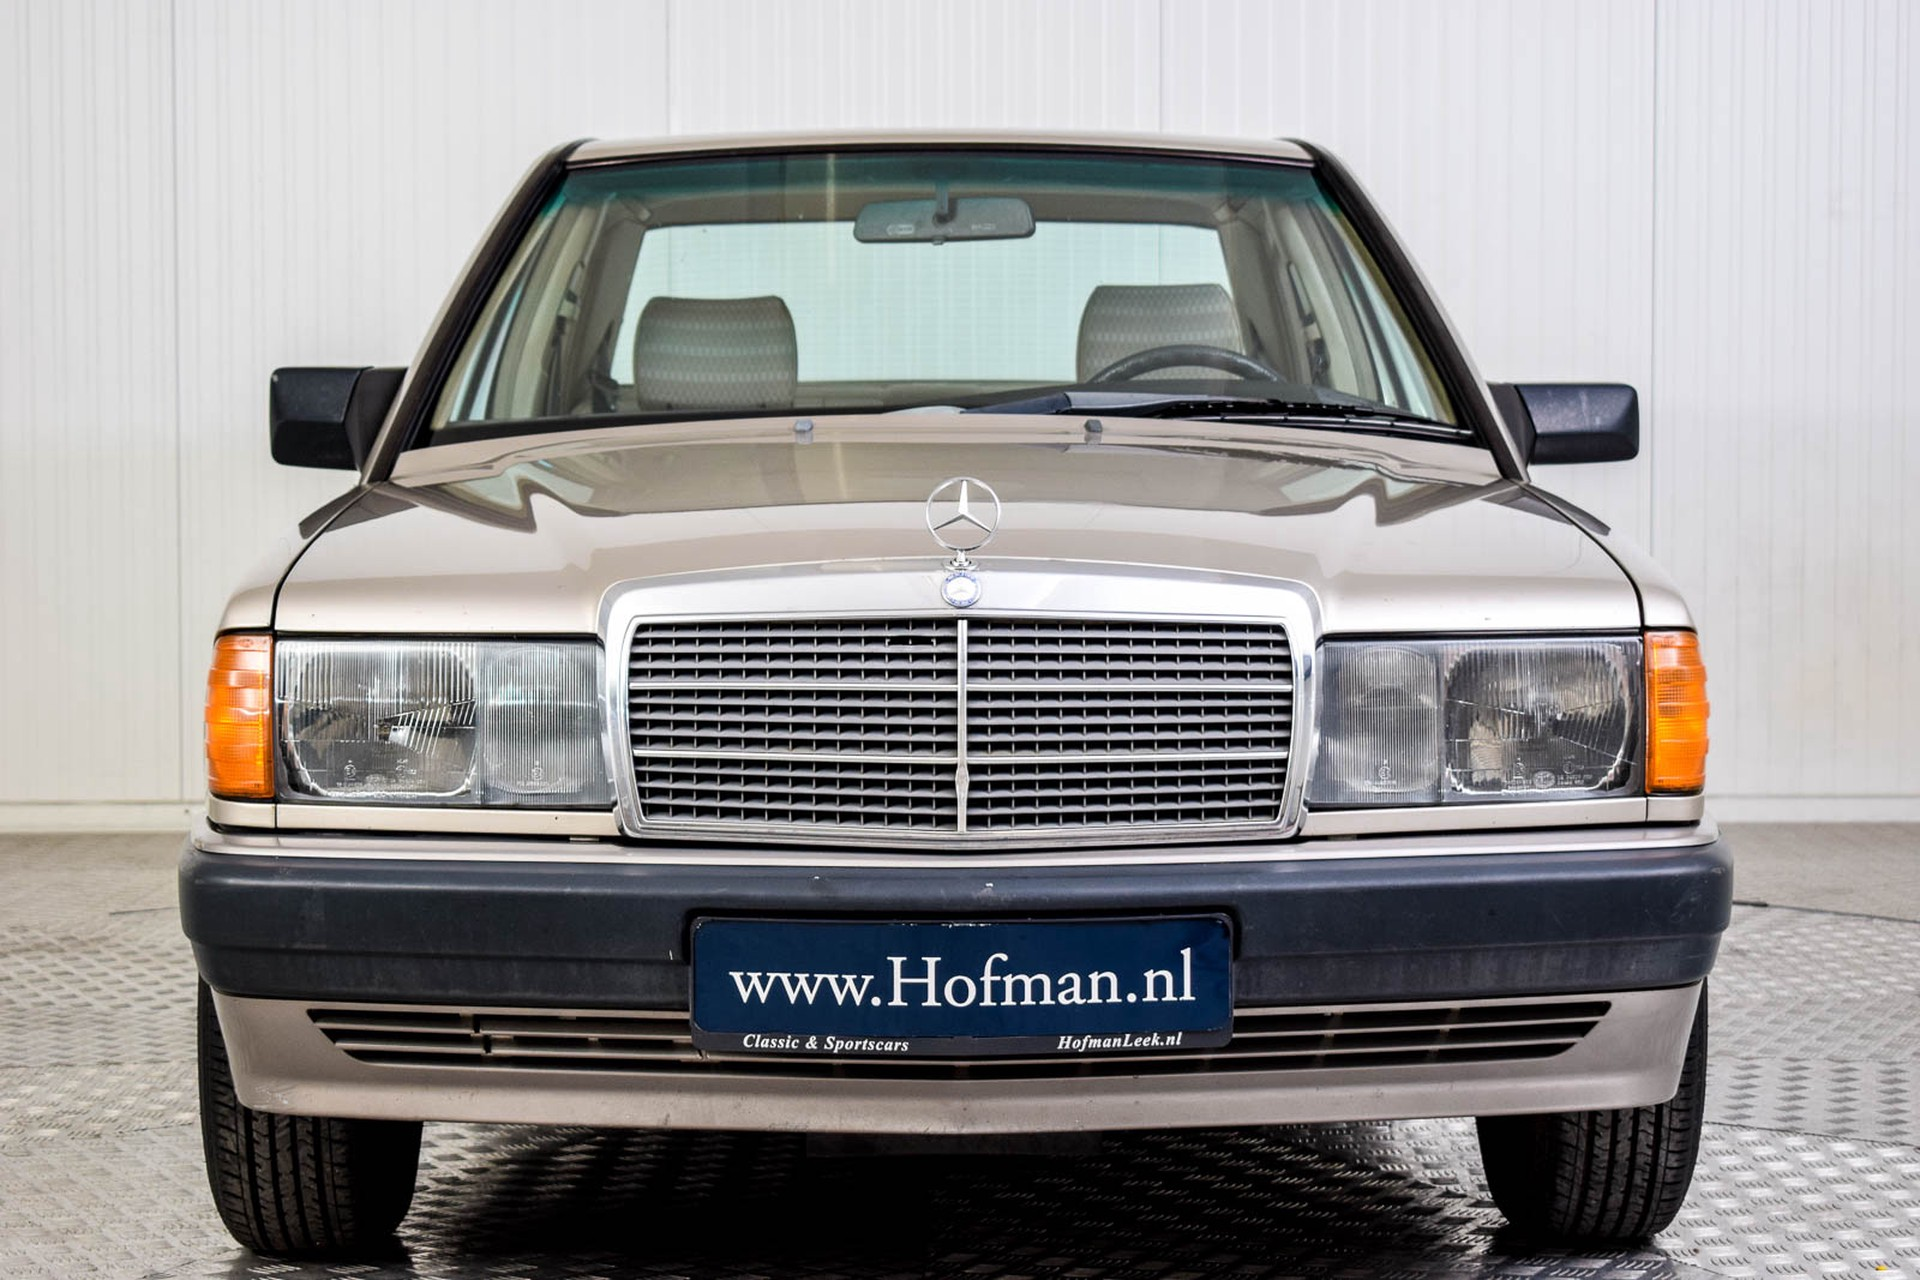 Mercedes-Benz 190 2.5 D Turbo Diesel Foto 3